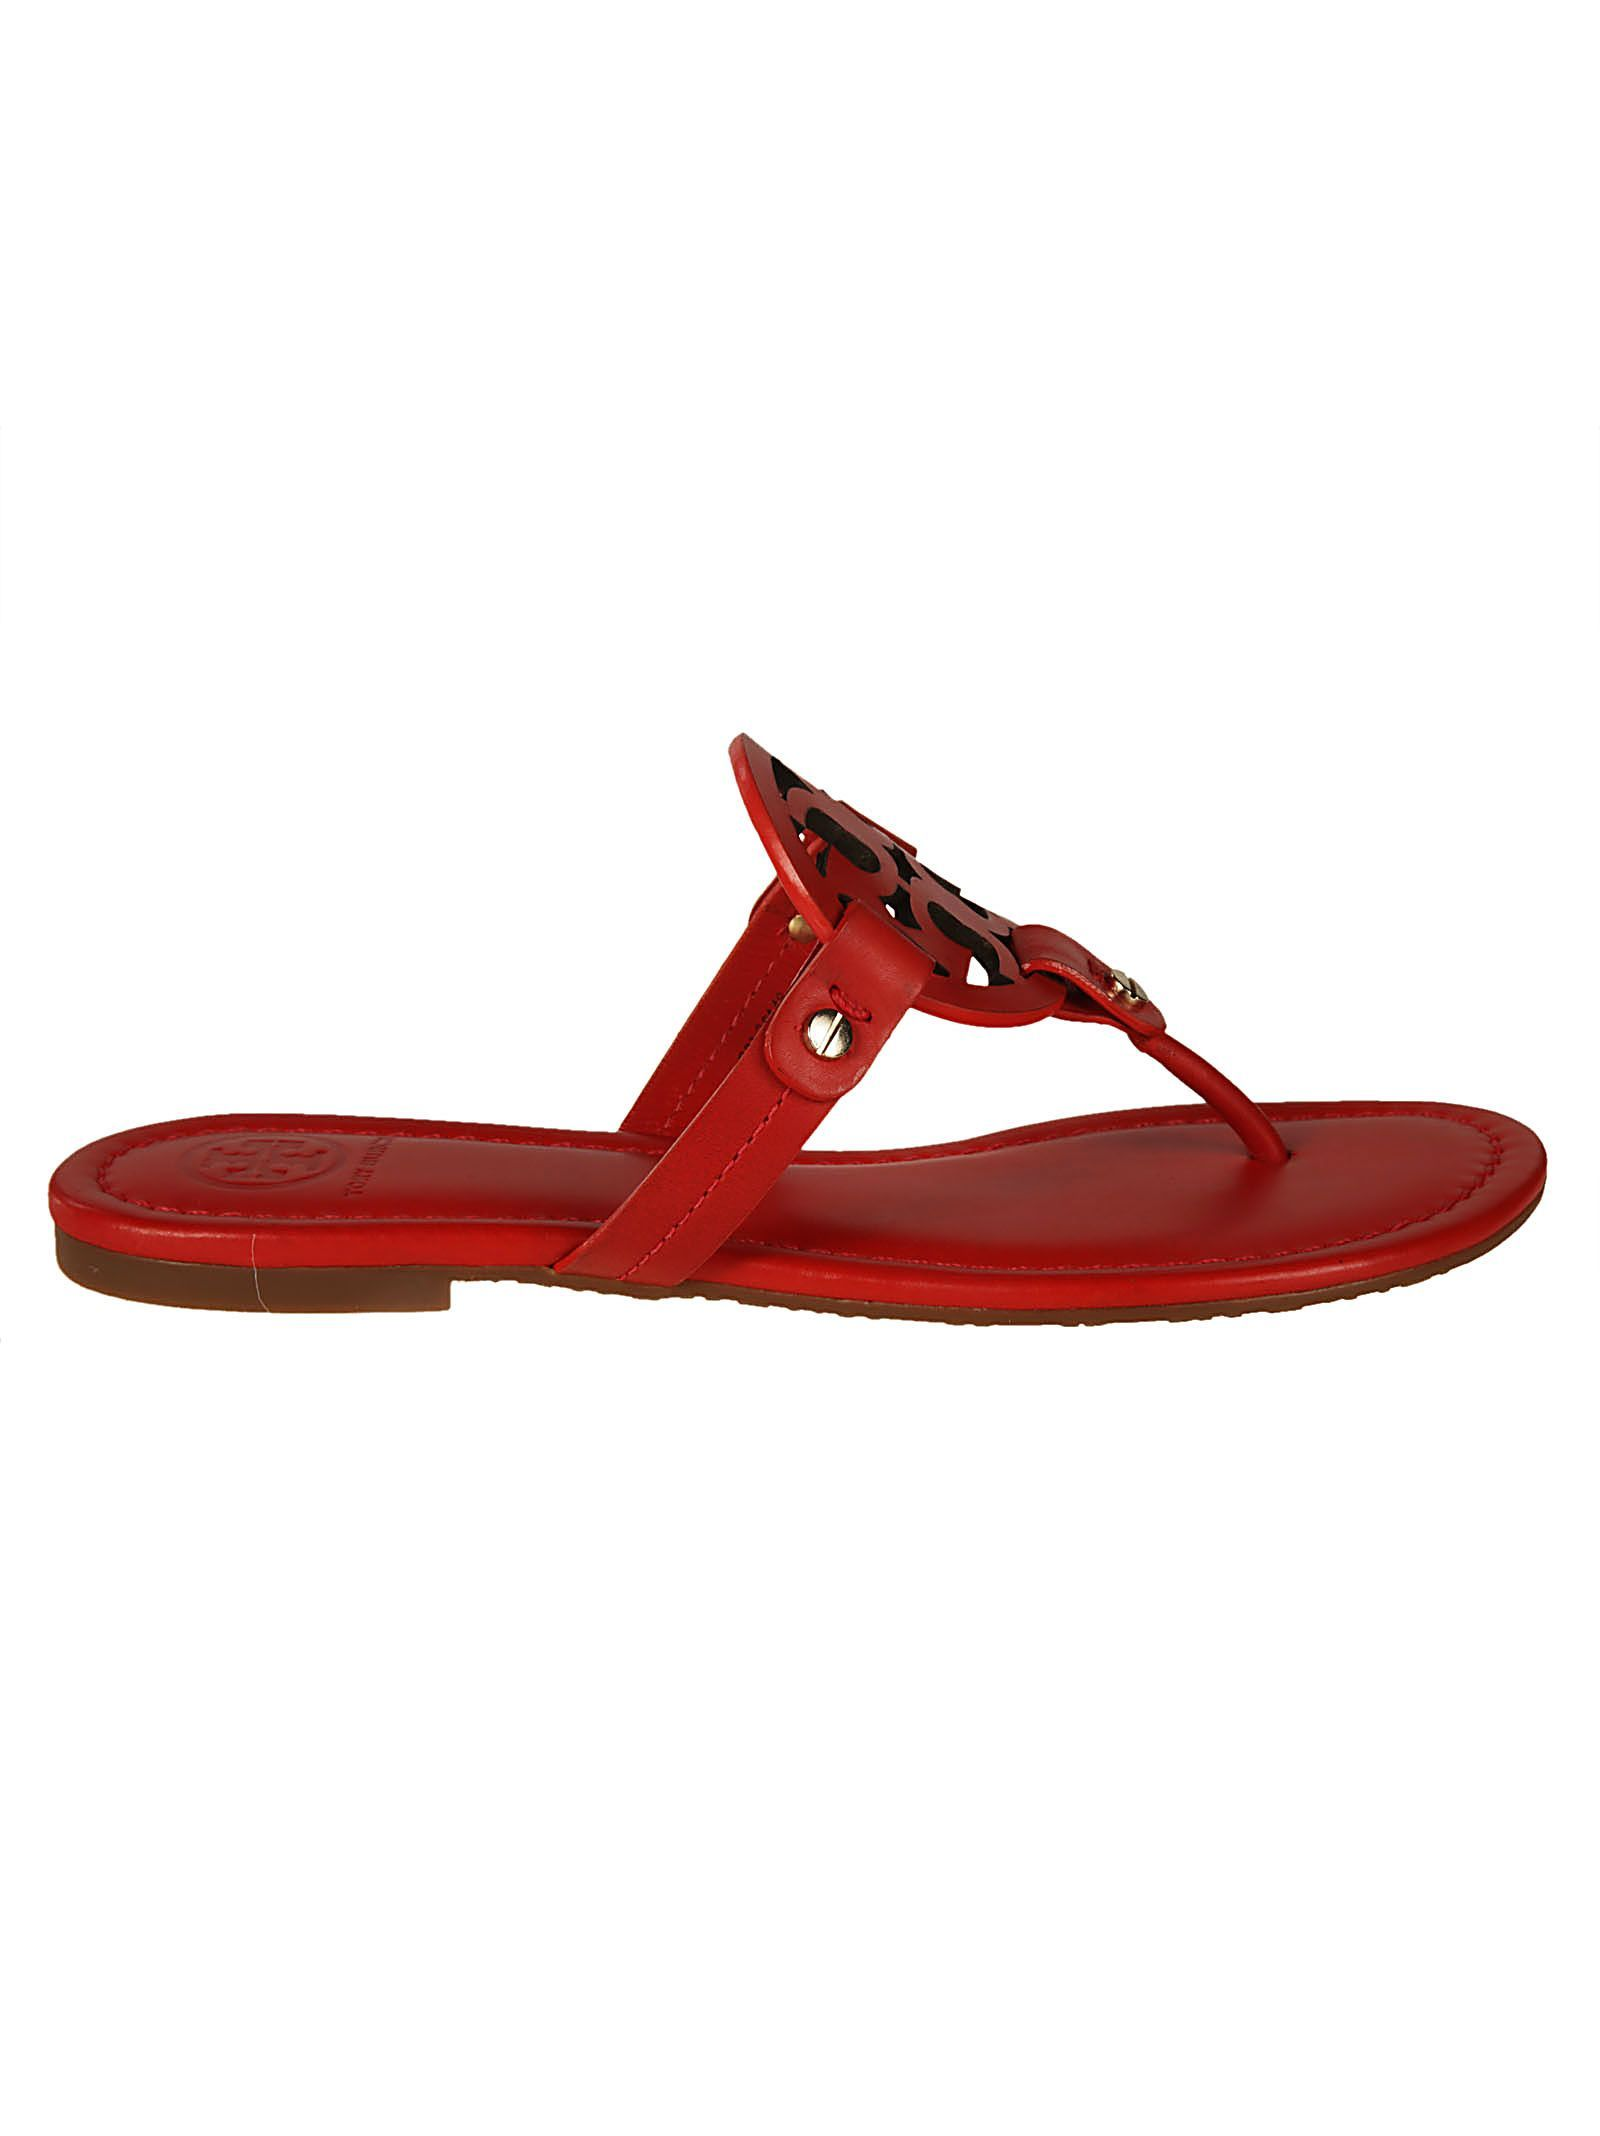 2c5f07cca2ca00 TORY BURCH MILLER FLAT SANDALS.  toryburch  shoes